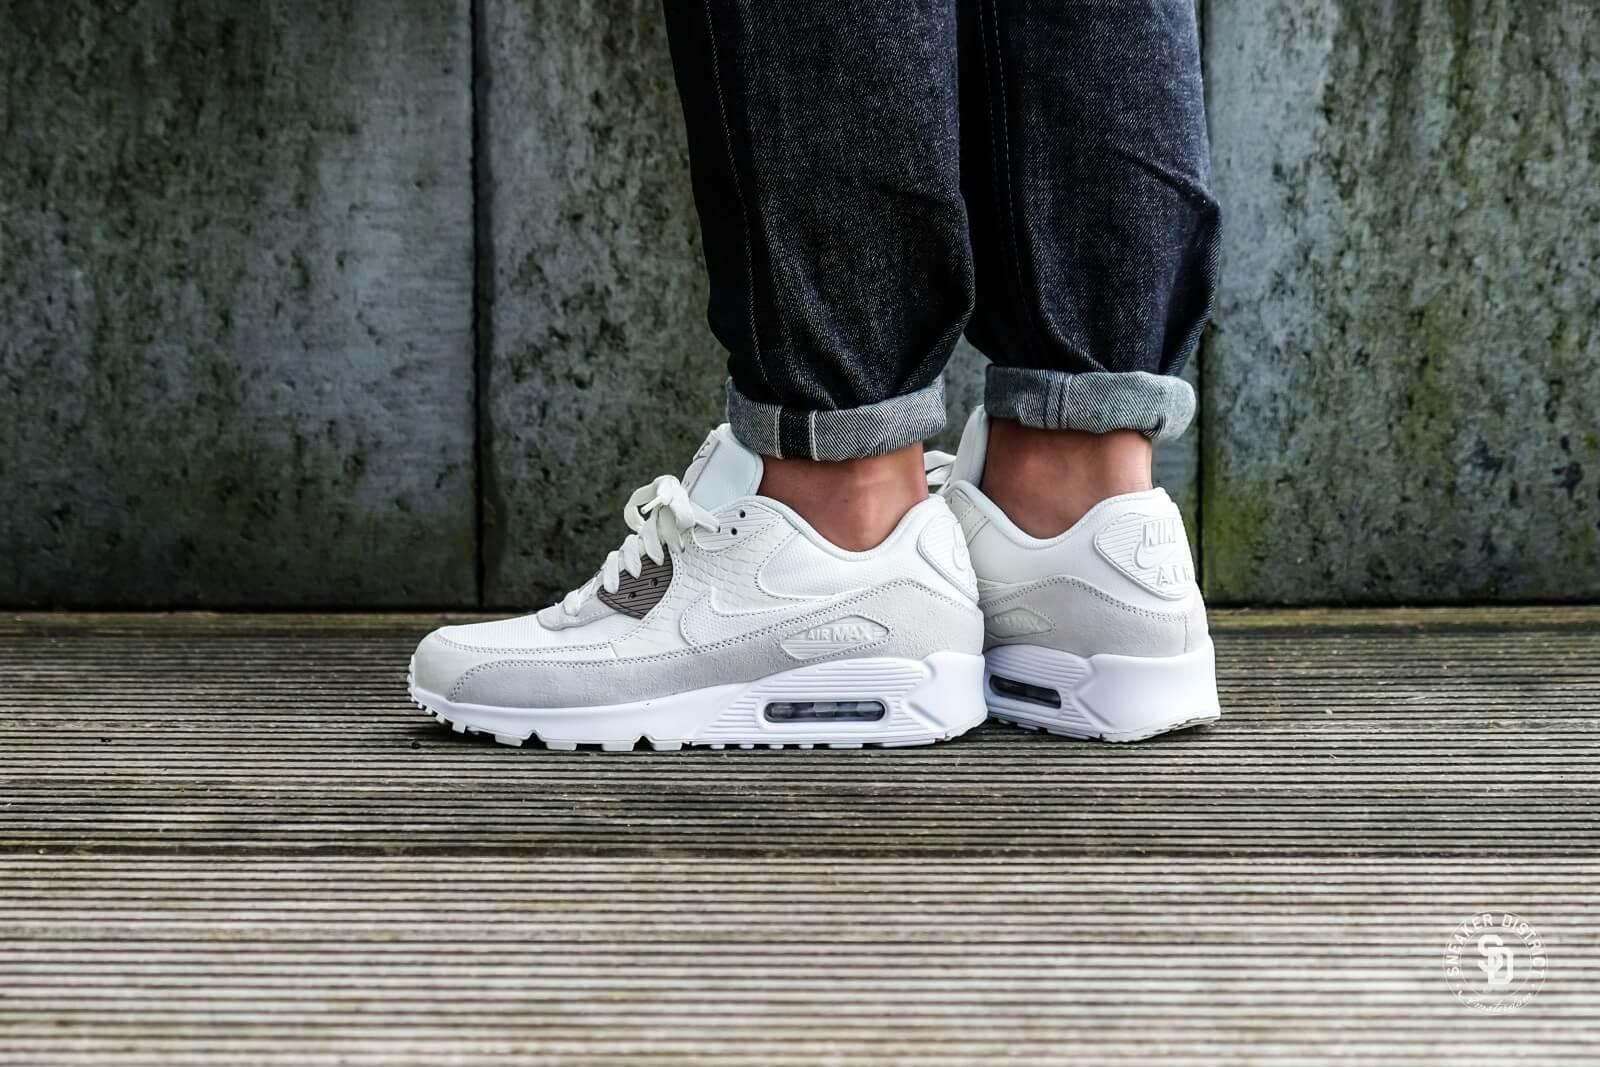 Nike Air Max 90 Premium SailSepia Stone White 700155 102